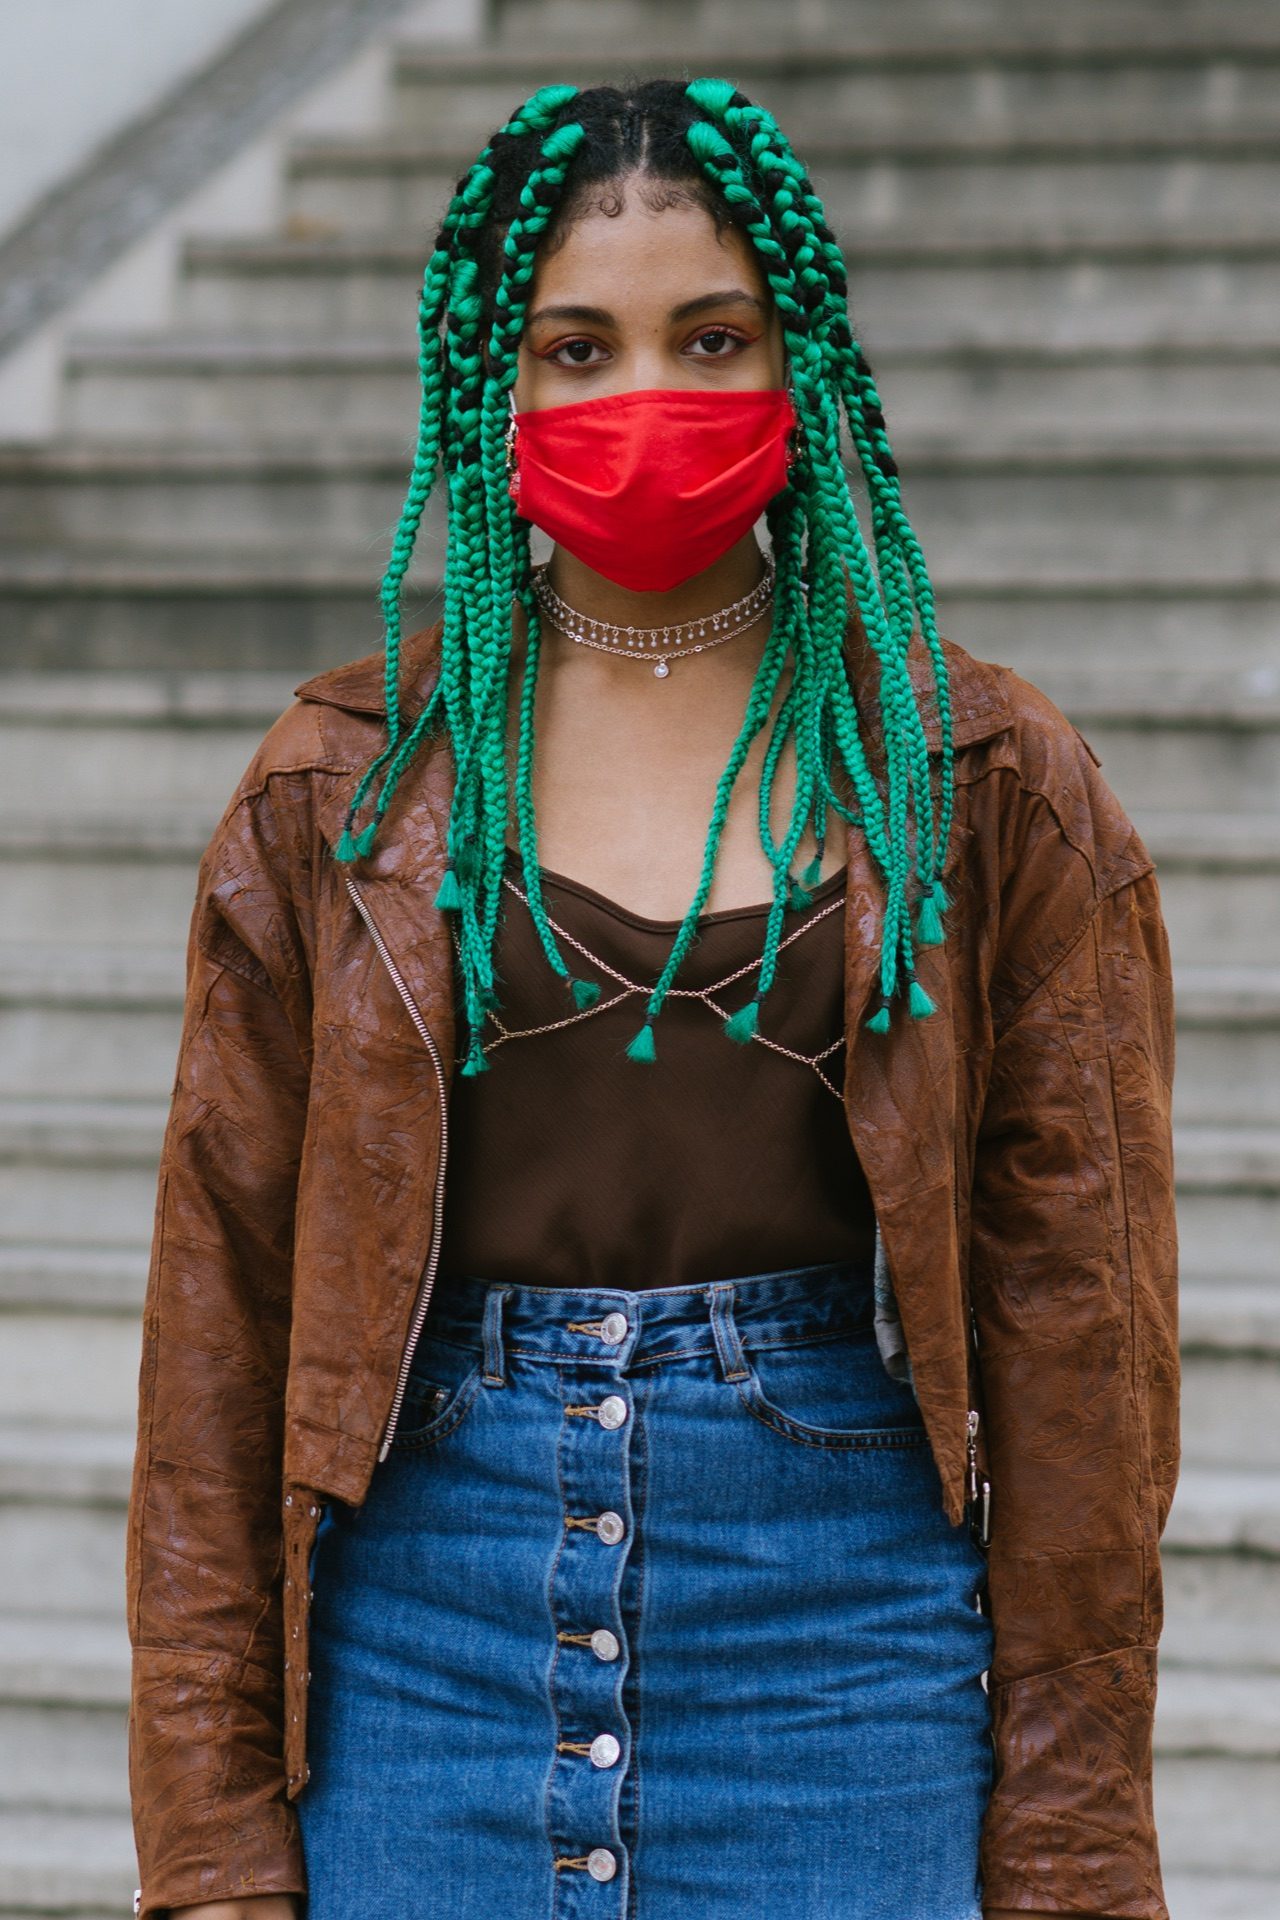 Vogue Singapore Paris Fashion Week Beauty Street Style Spring Summer 2021 Makeup Hair